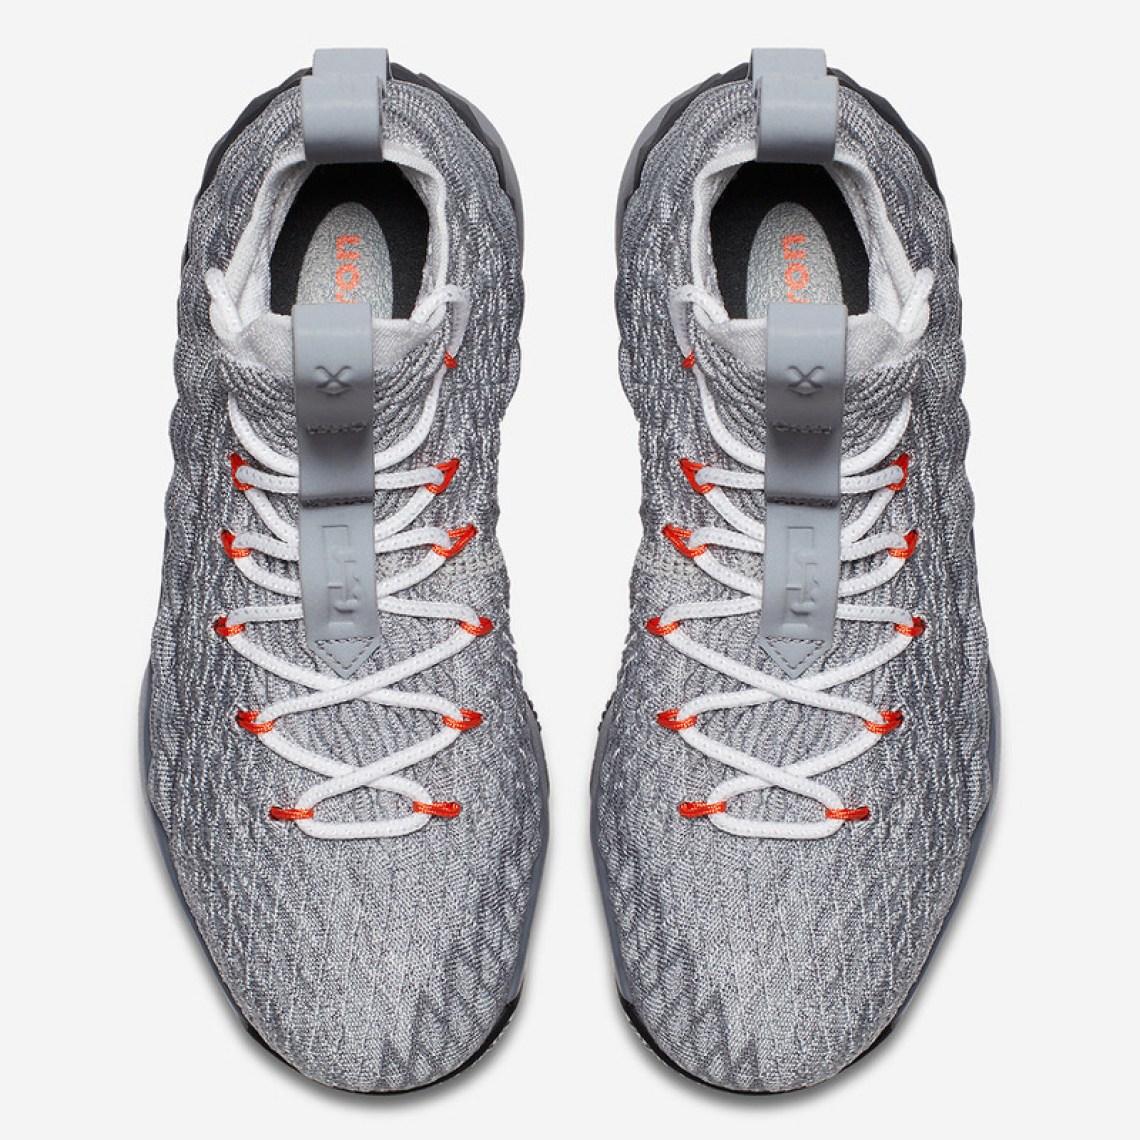 brand new c5014 a84de Nike LeBron 15